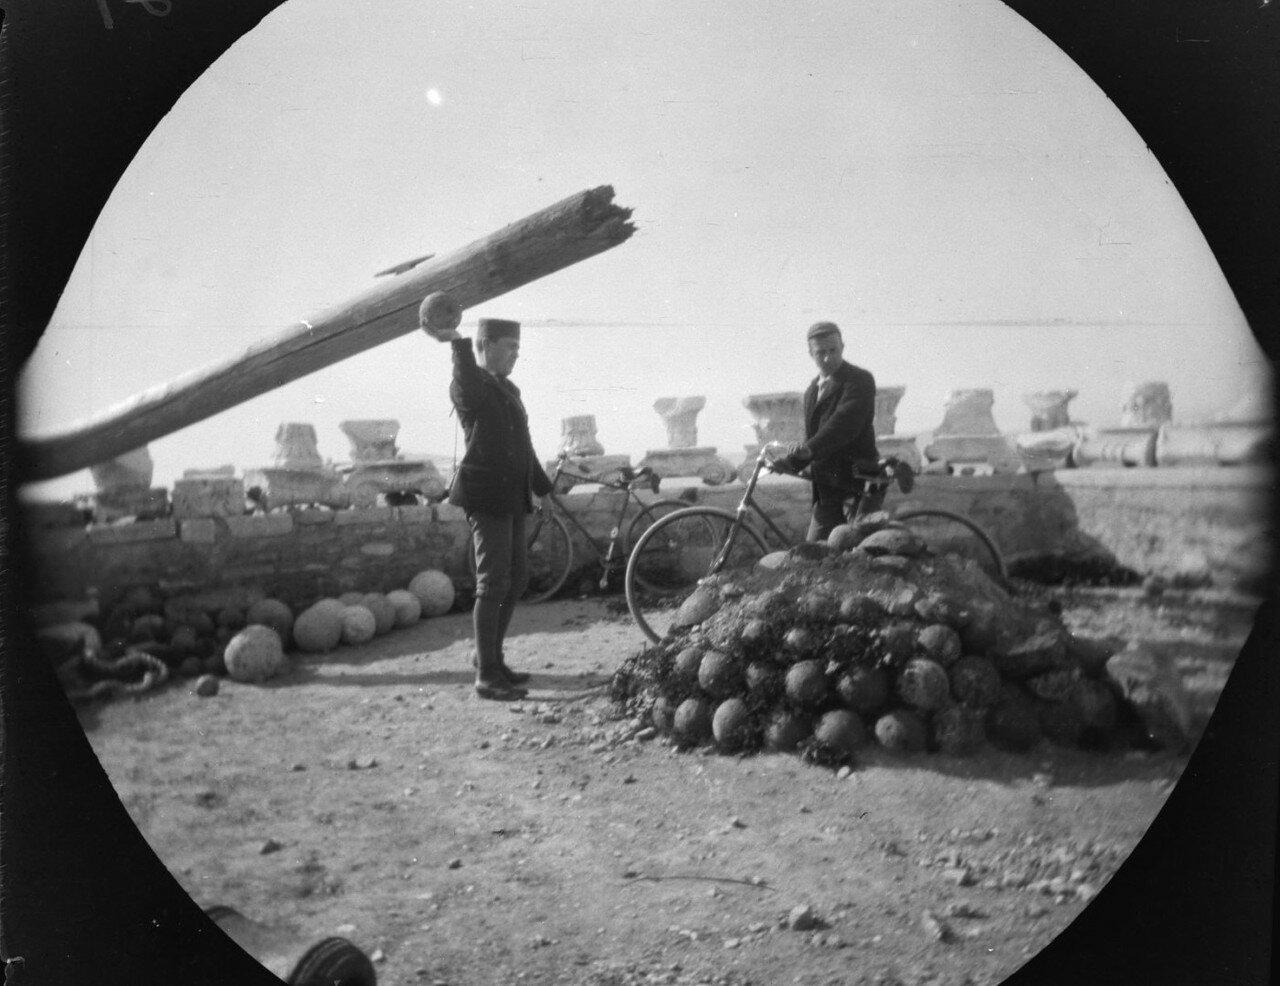 Уильям Захтлебен, Томас Аллен  рядом с горкой пушечных ядер на Акрополе